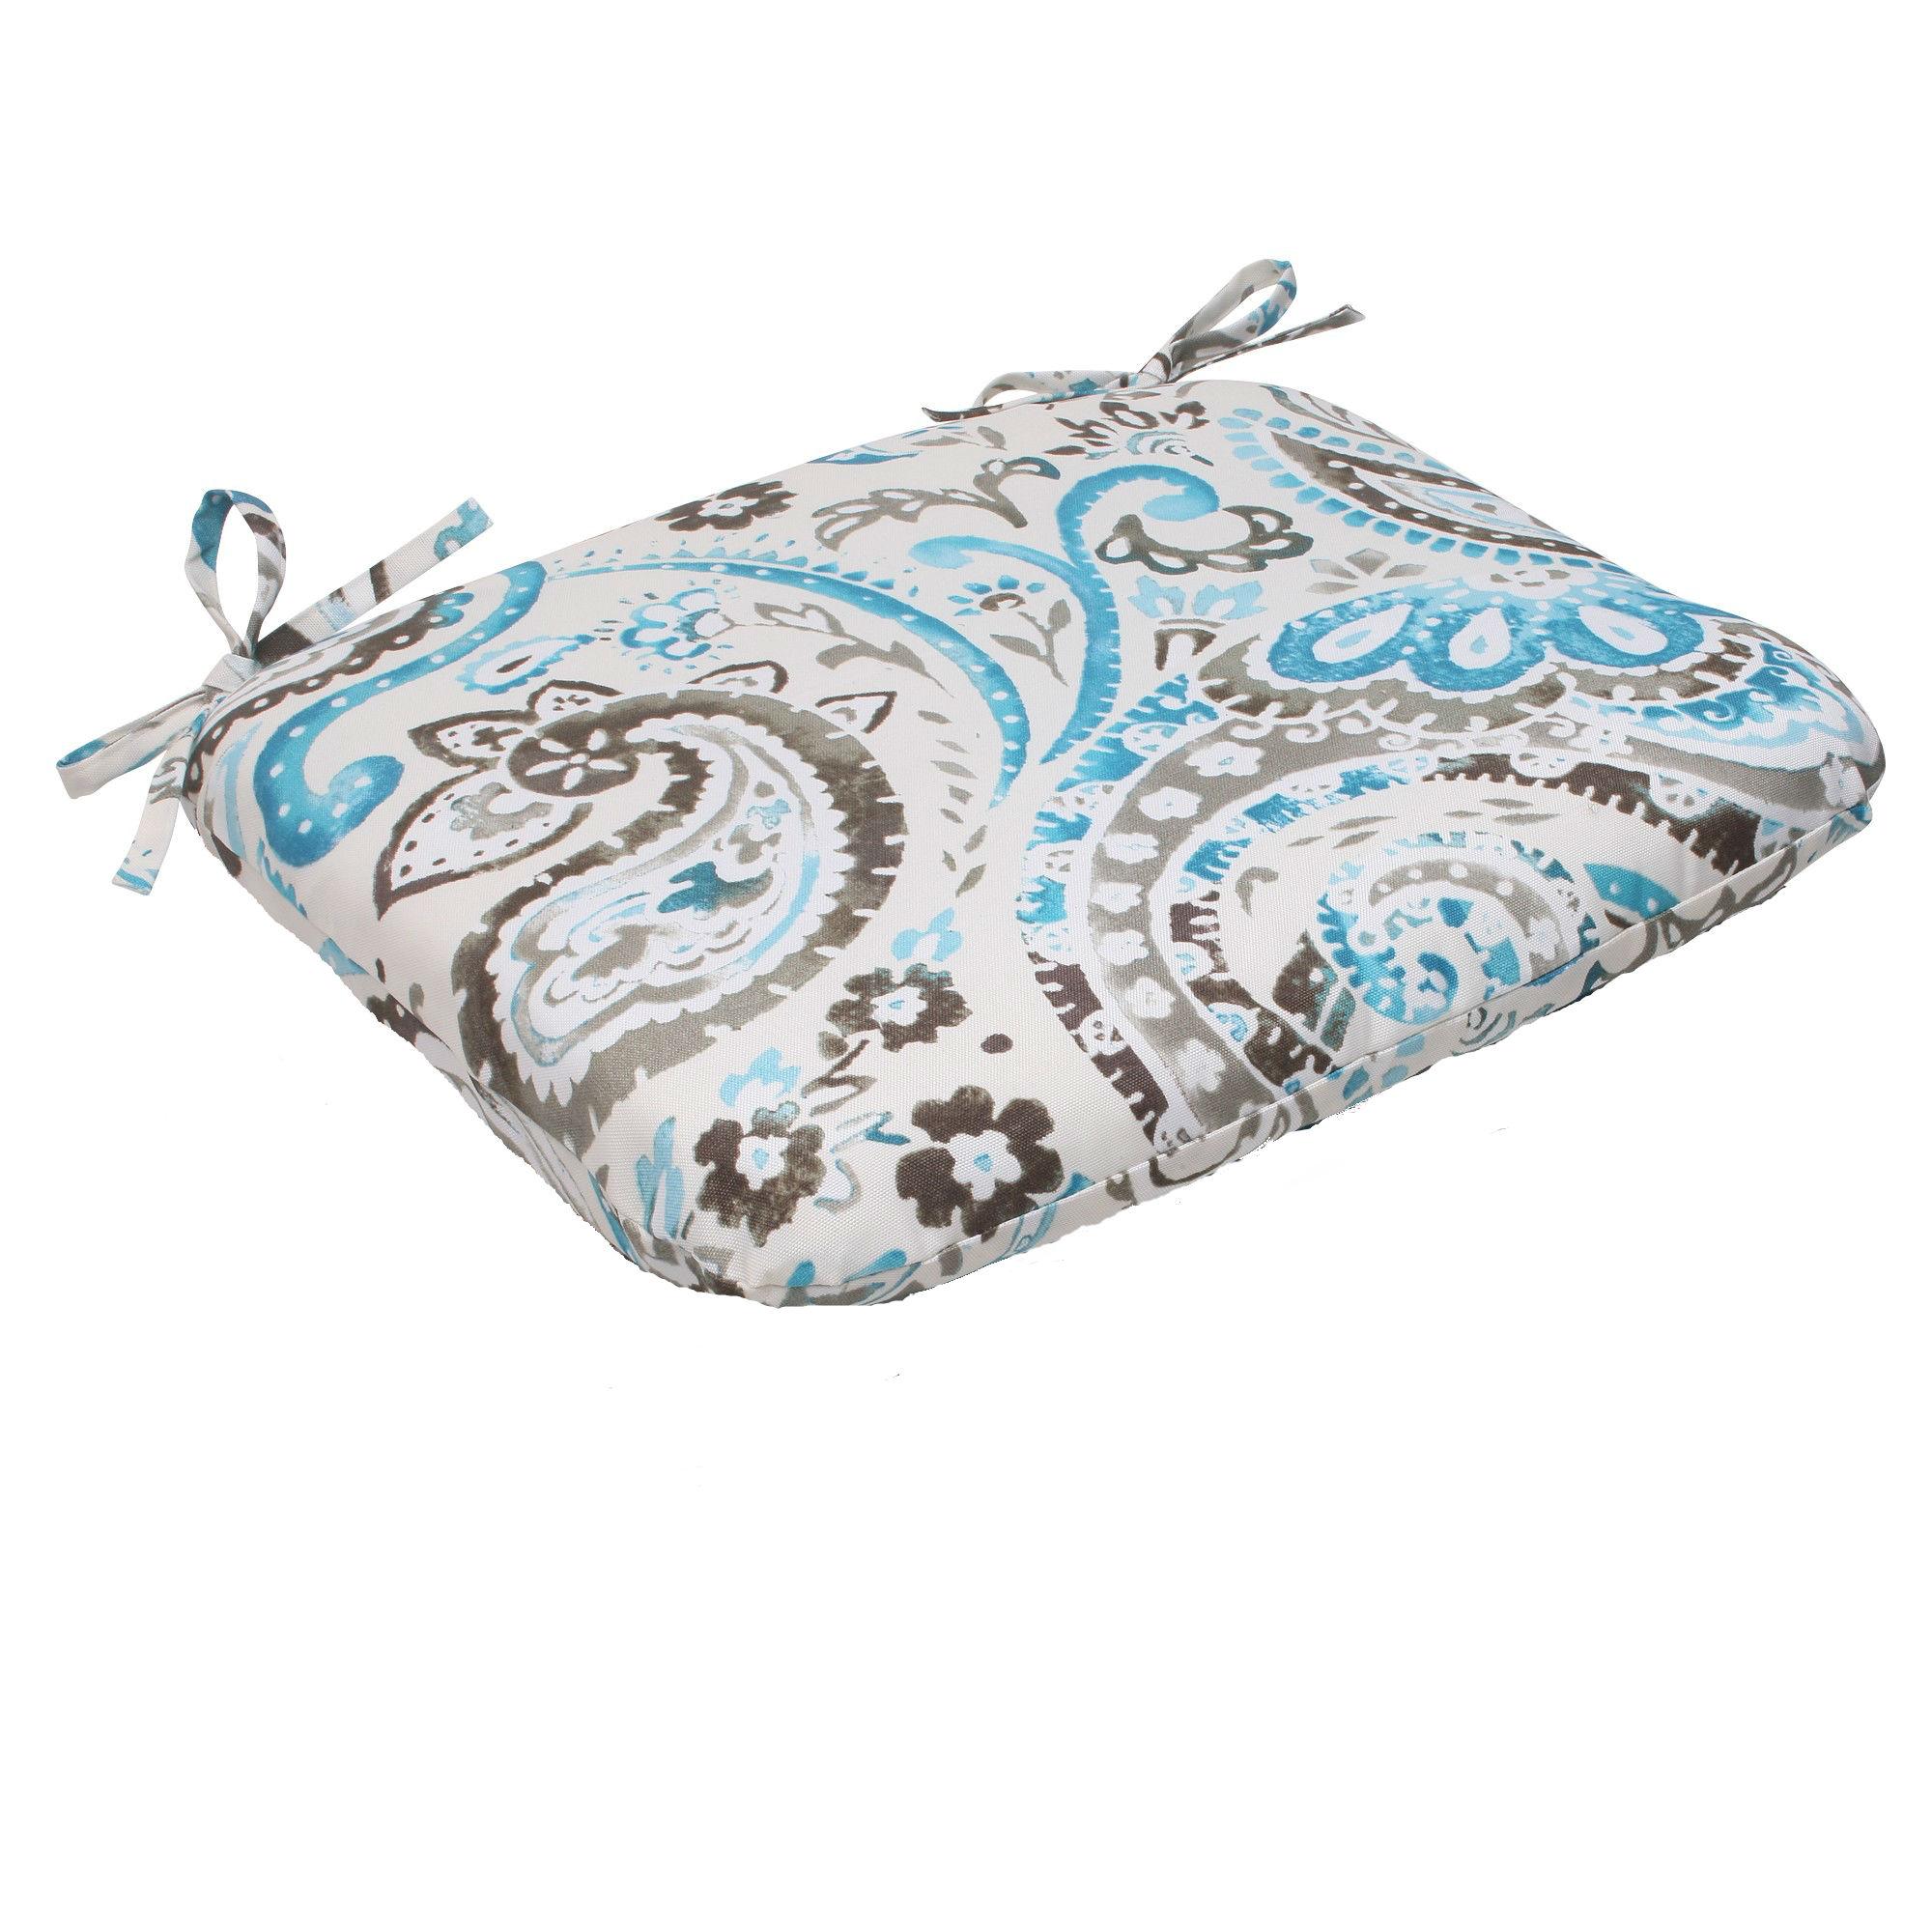 CC Outdoor Living Turquoise Gray Paisley Swirl Outdoor ... on Cc Outdoor Living id=16676